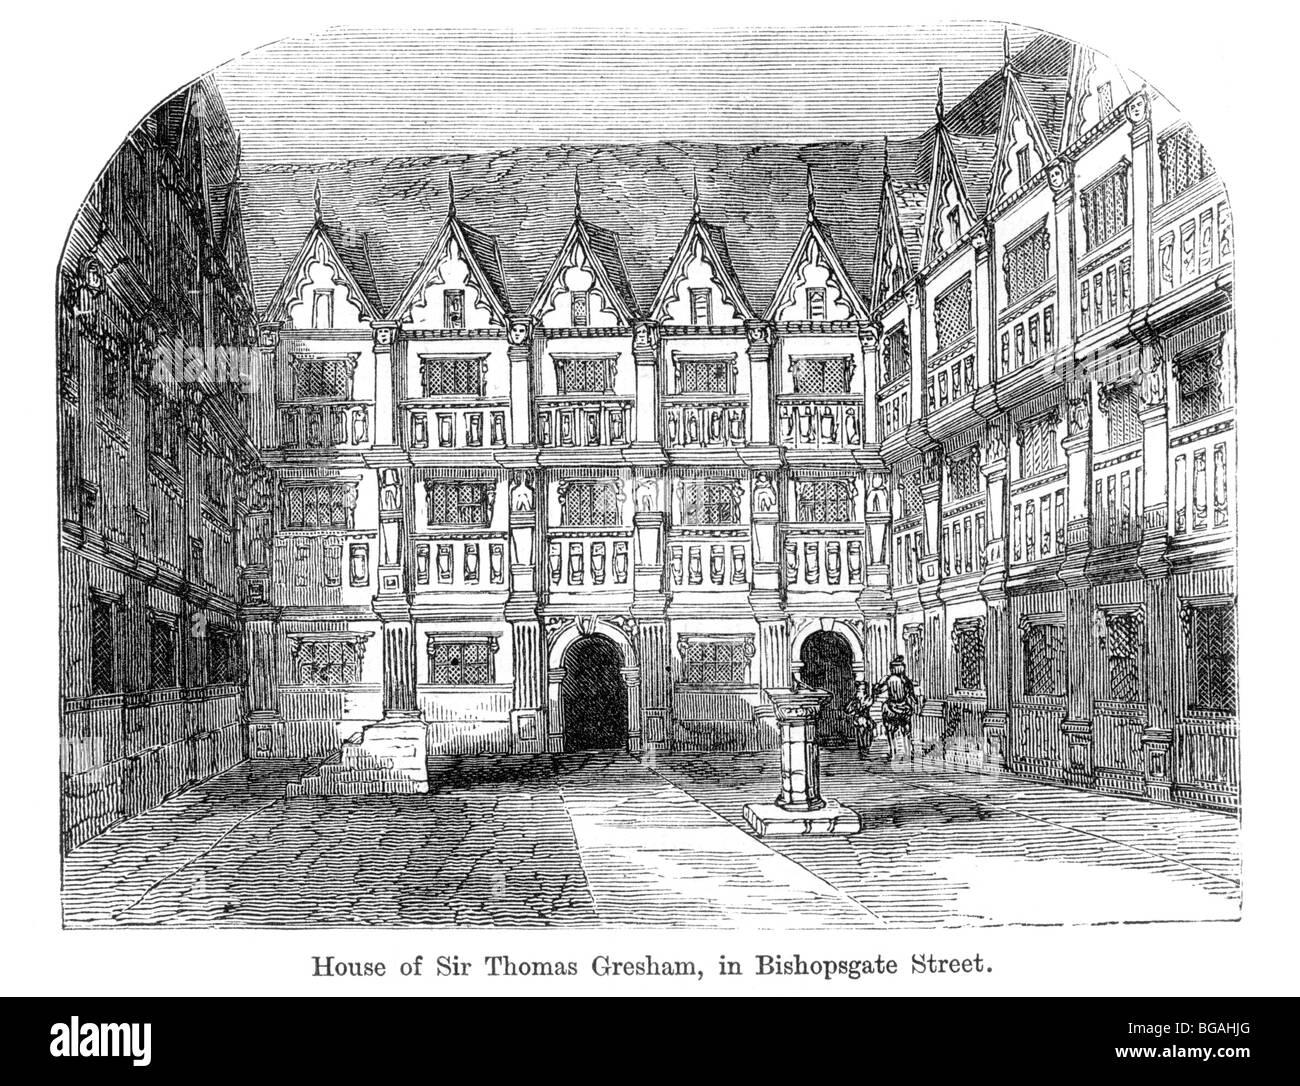 Illustration; House of Sir Thomas Gresham, Bishopsgate Street, London, erected in 1563 and demolished in 1768 - Stock Image